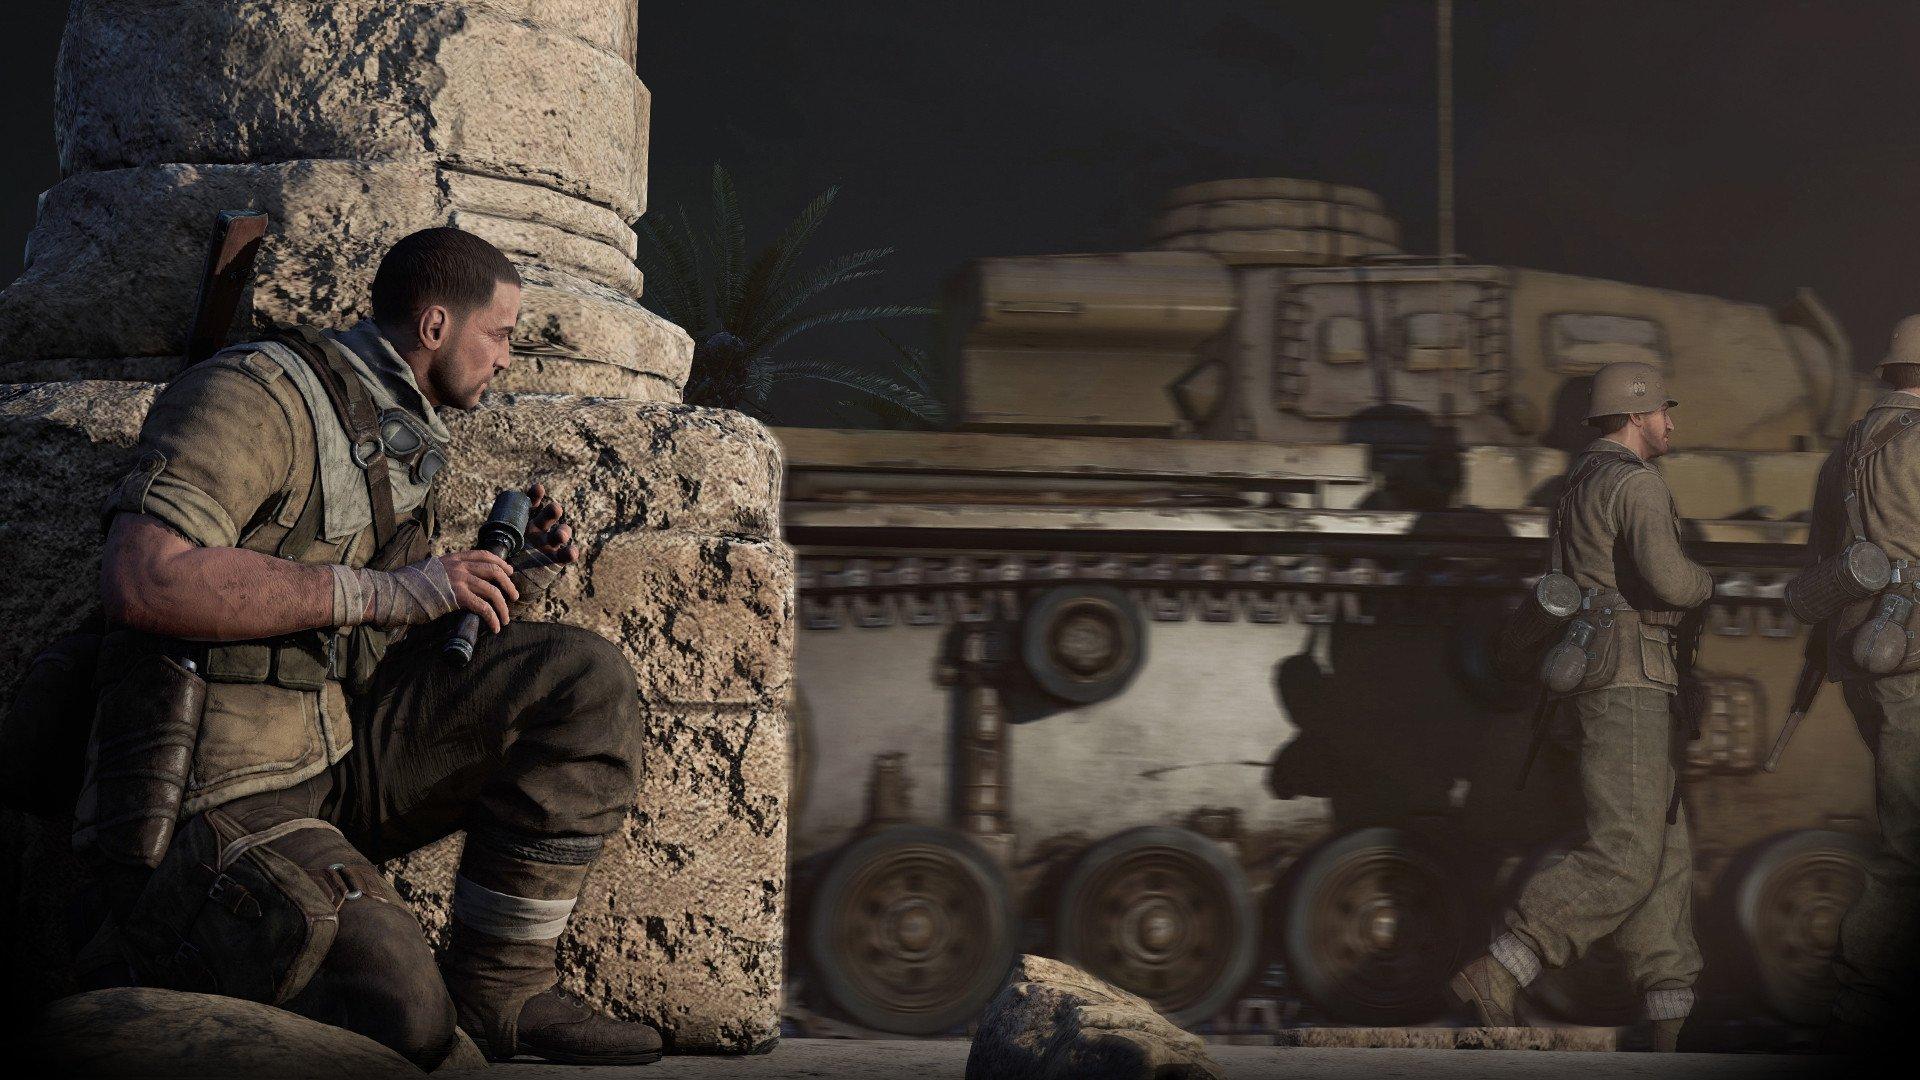 sniper elite 3 2537591 تصاویر جدیدی از Sniper Elite 3 منتشر شد : بیابان گردی در آفریقا